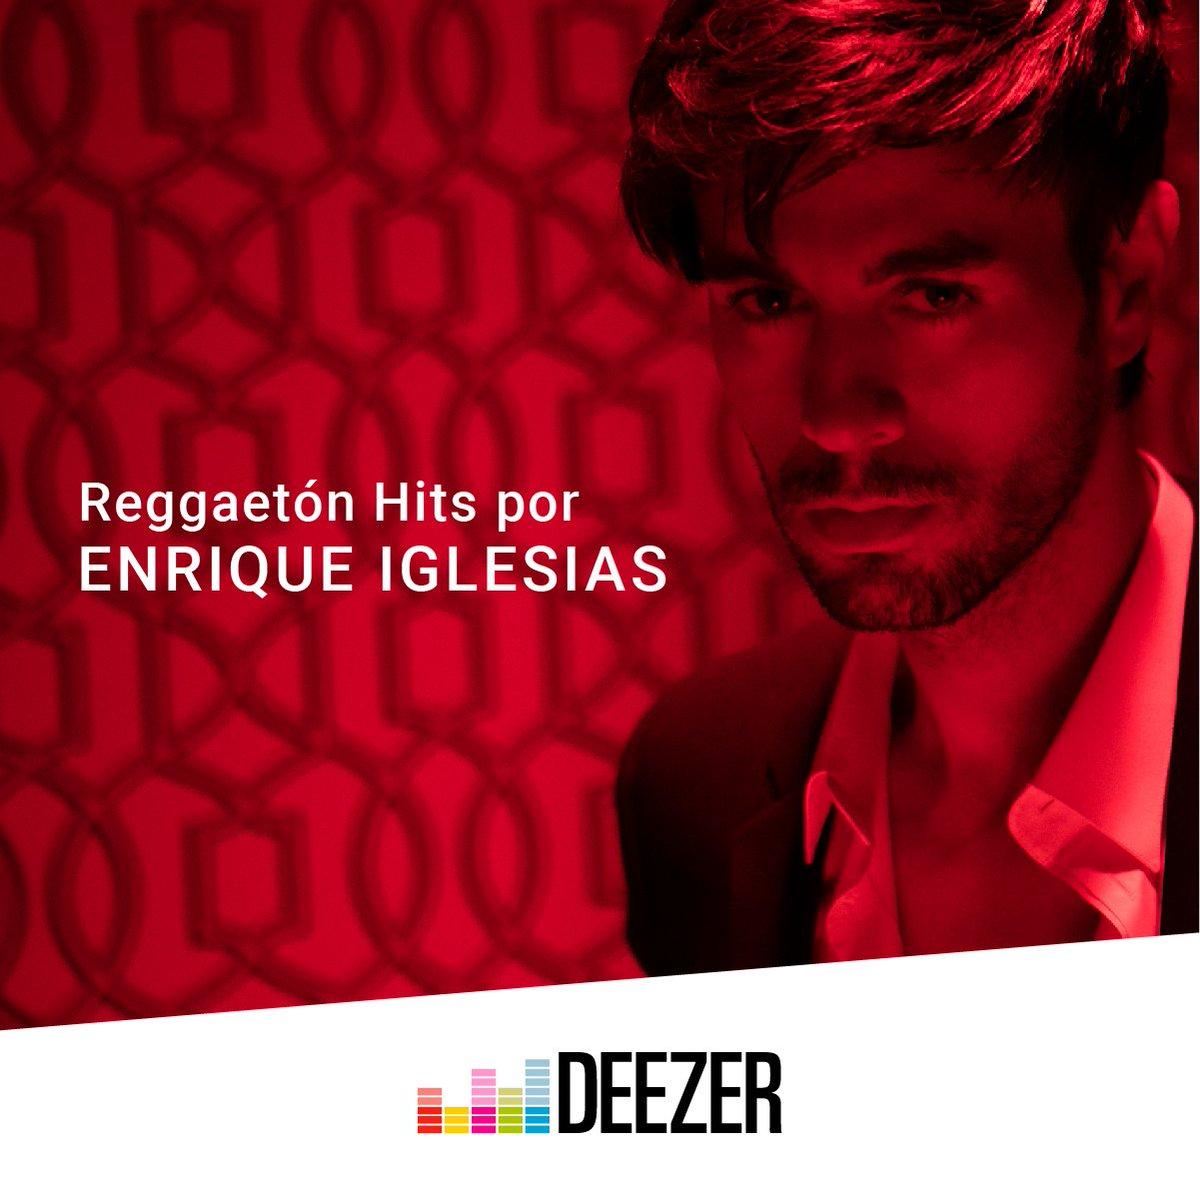 "Check out #ELBAÑO on the Enrique Curated Playlist on Deezer ""Reggaetón Hits"" https://t.co/xBUrbDWe21 https://t.co/XtBUuT12Wx"